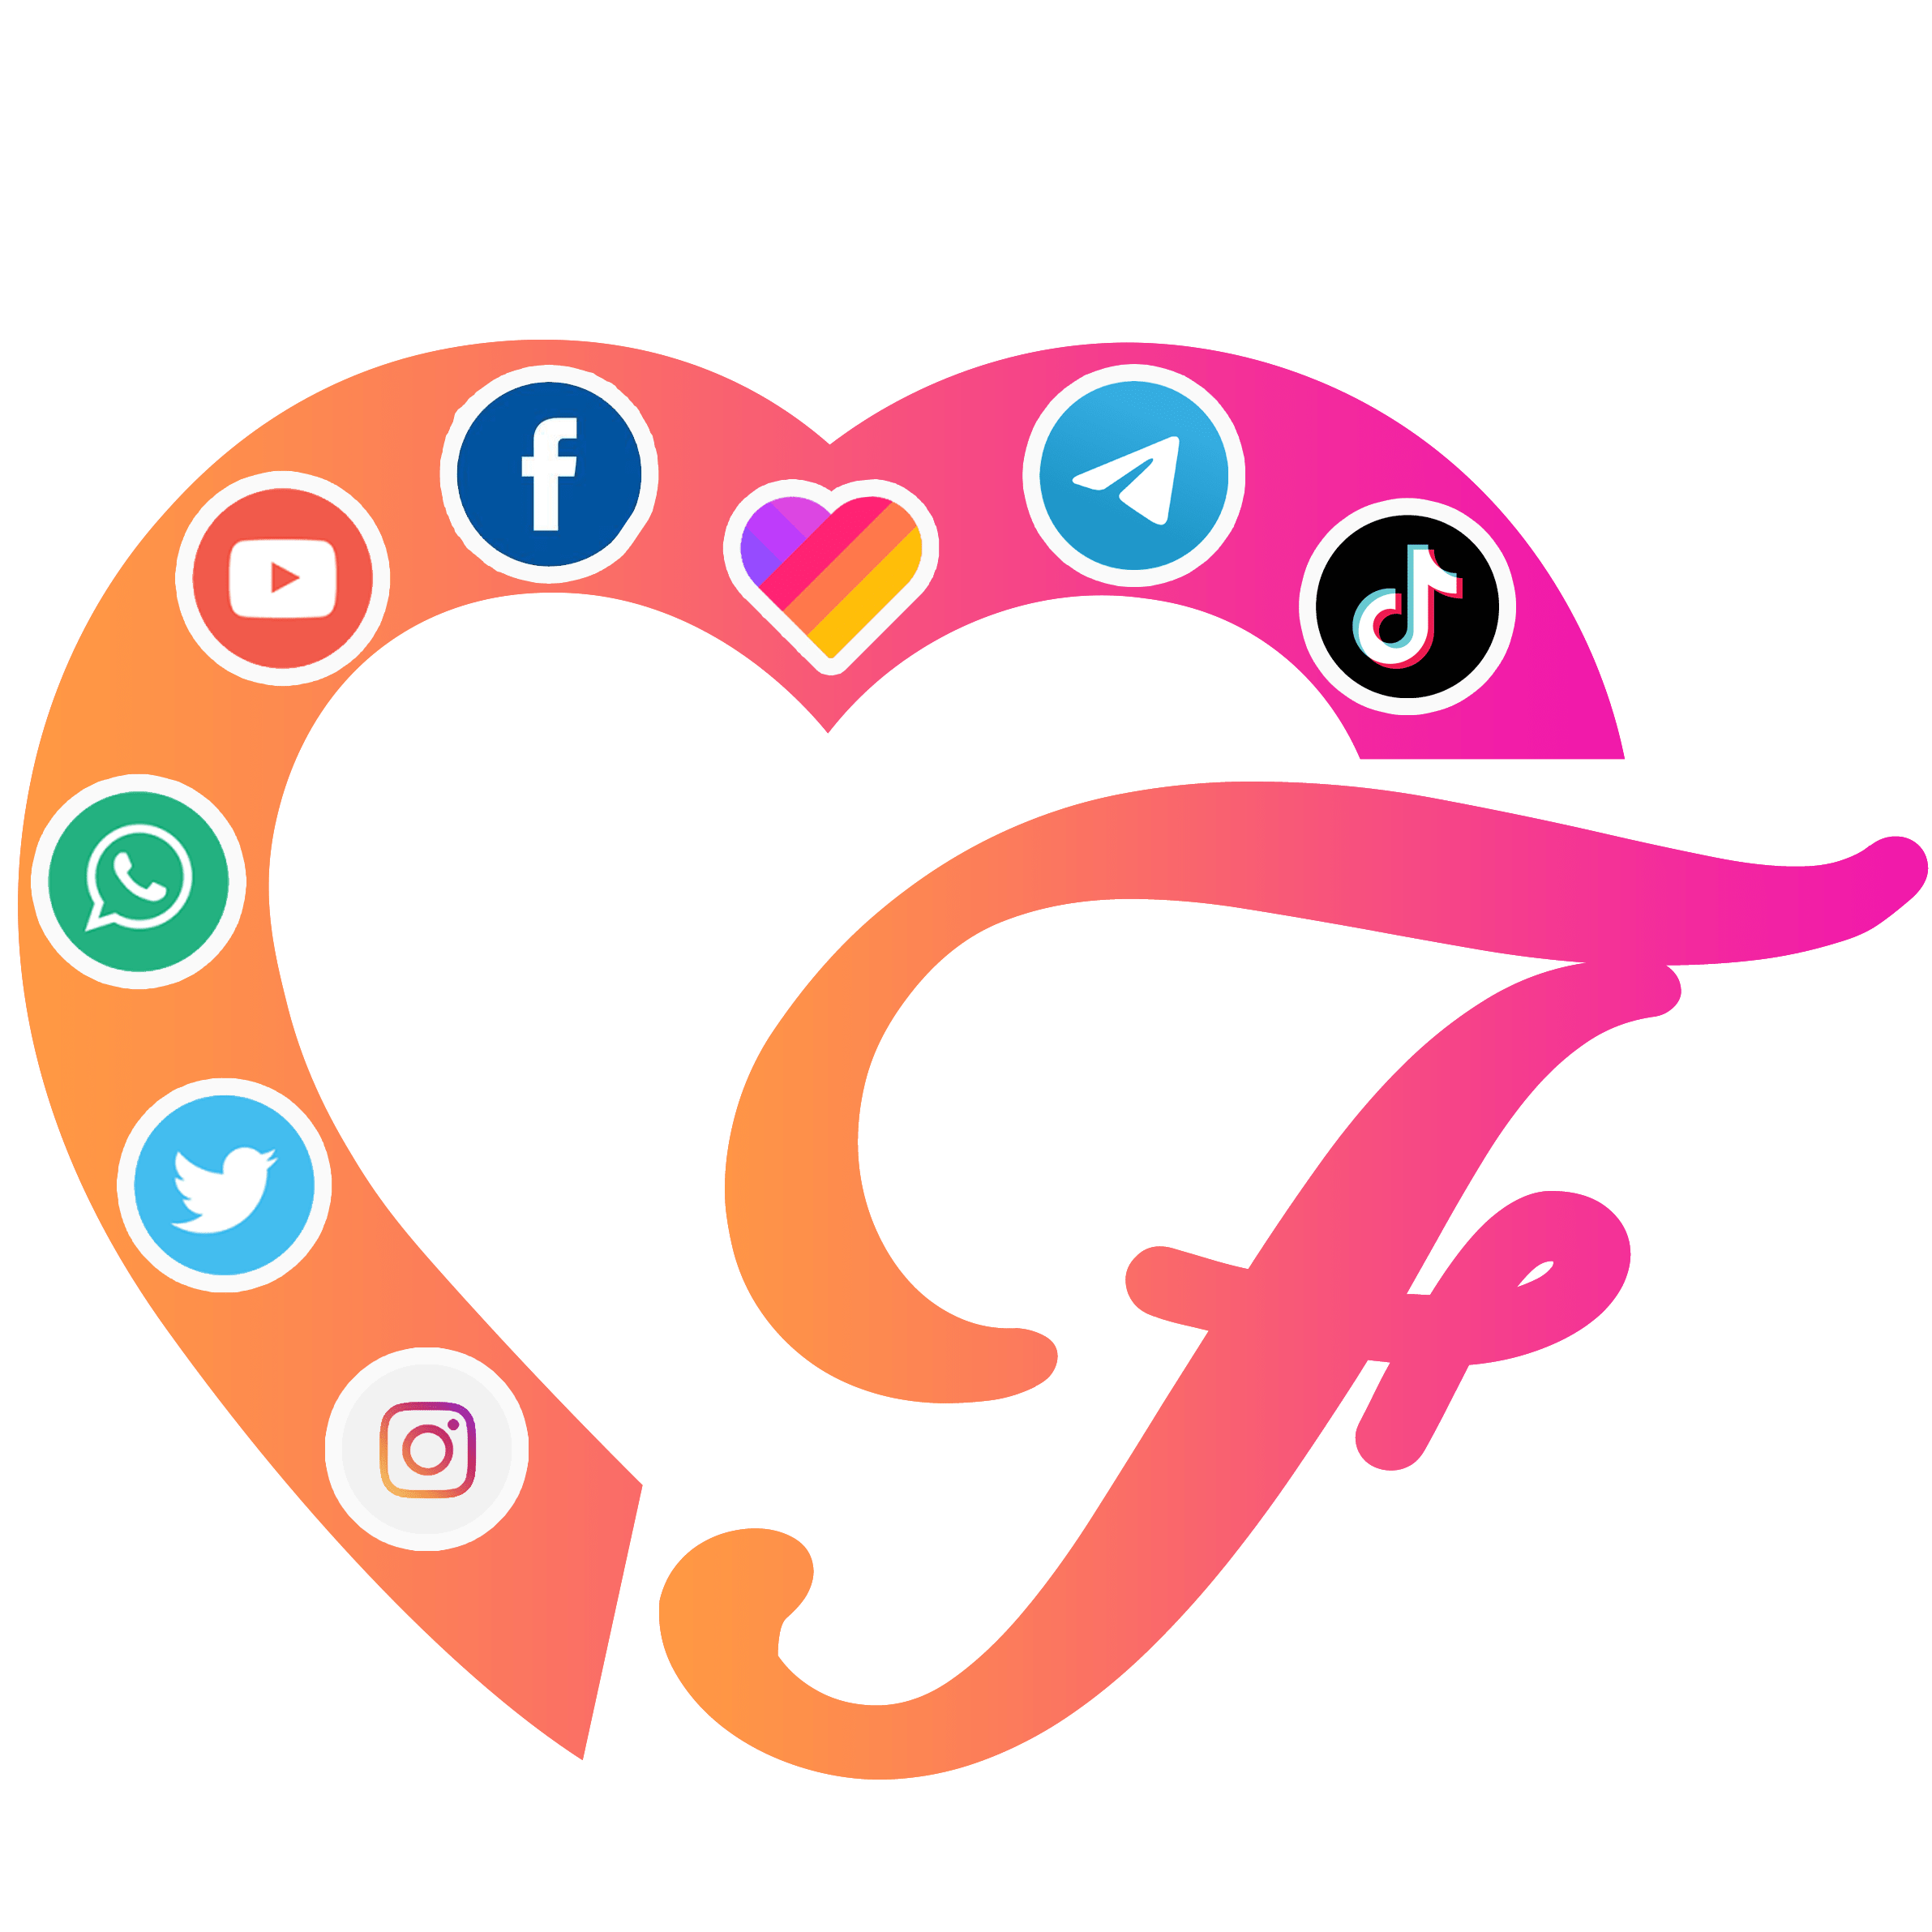 مجله شبکه اجتماعی